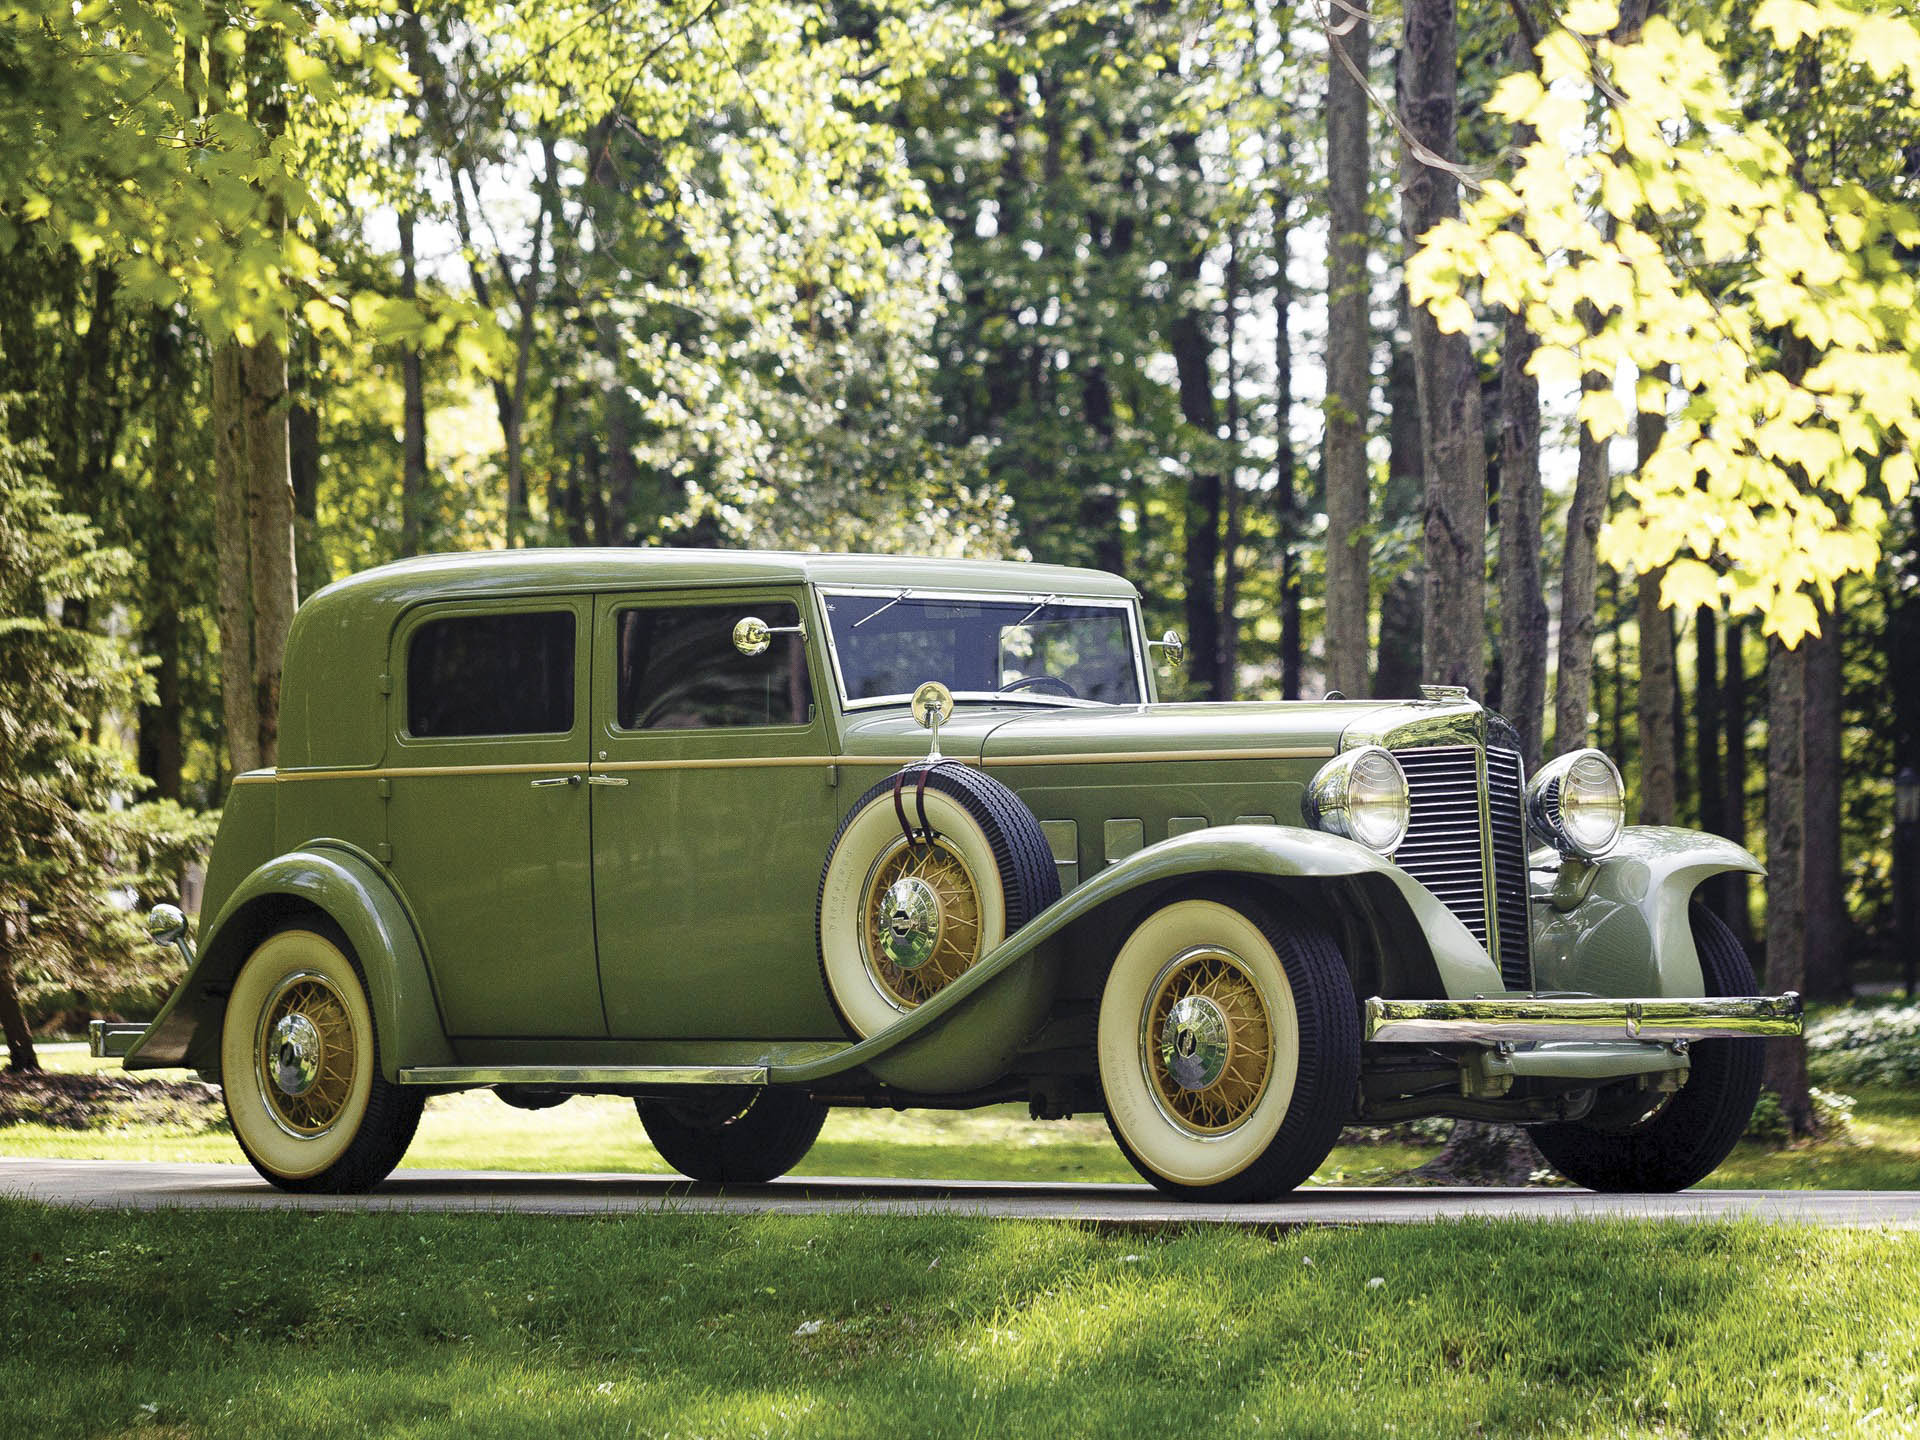 1932 Marmon Sixteen Close-Coupled Sedan by LeBaron